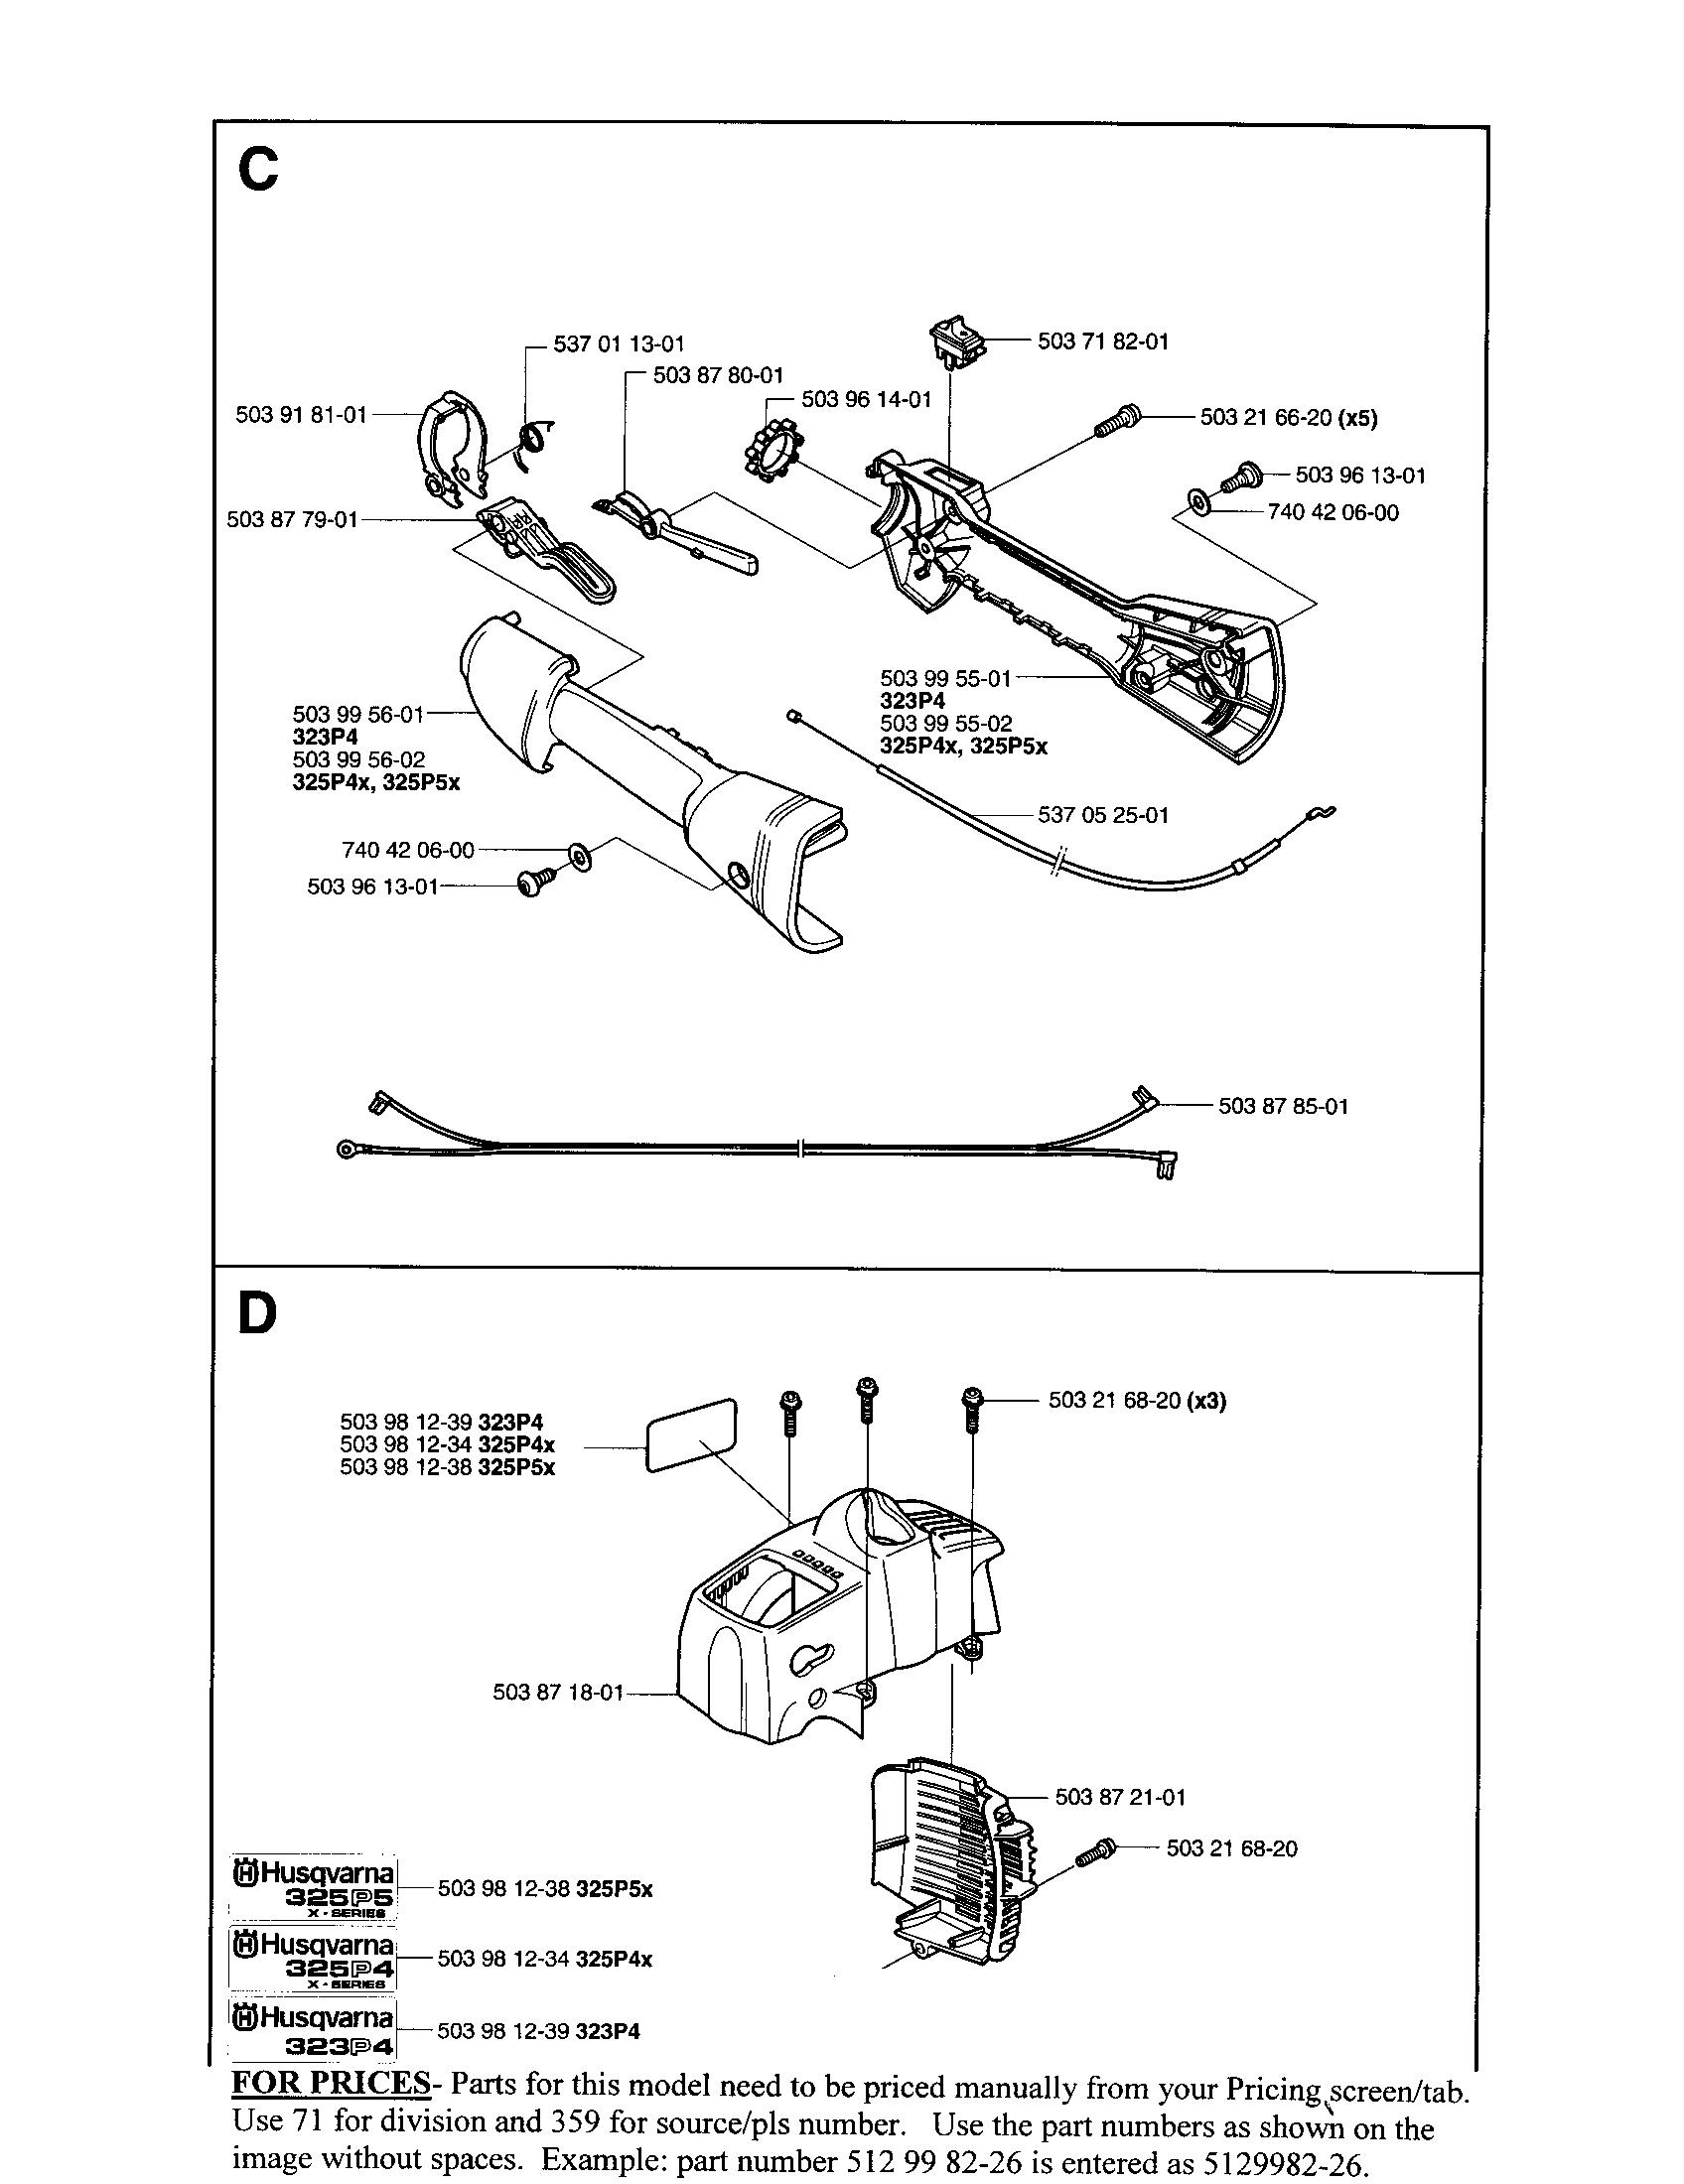 Husqvarna model 325P4 attachments, line trimmers